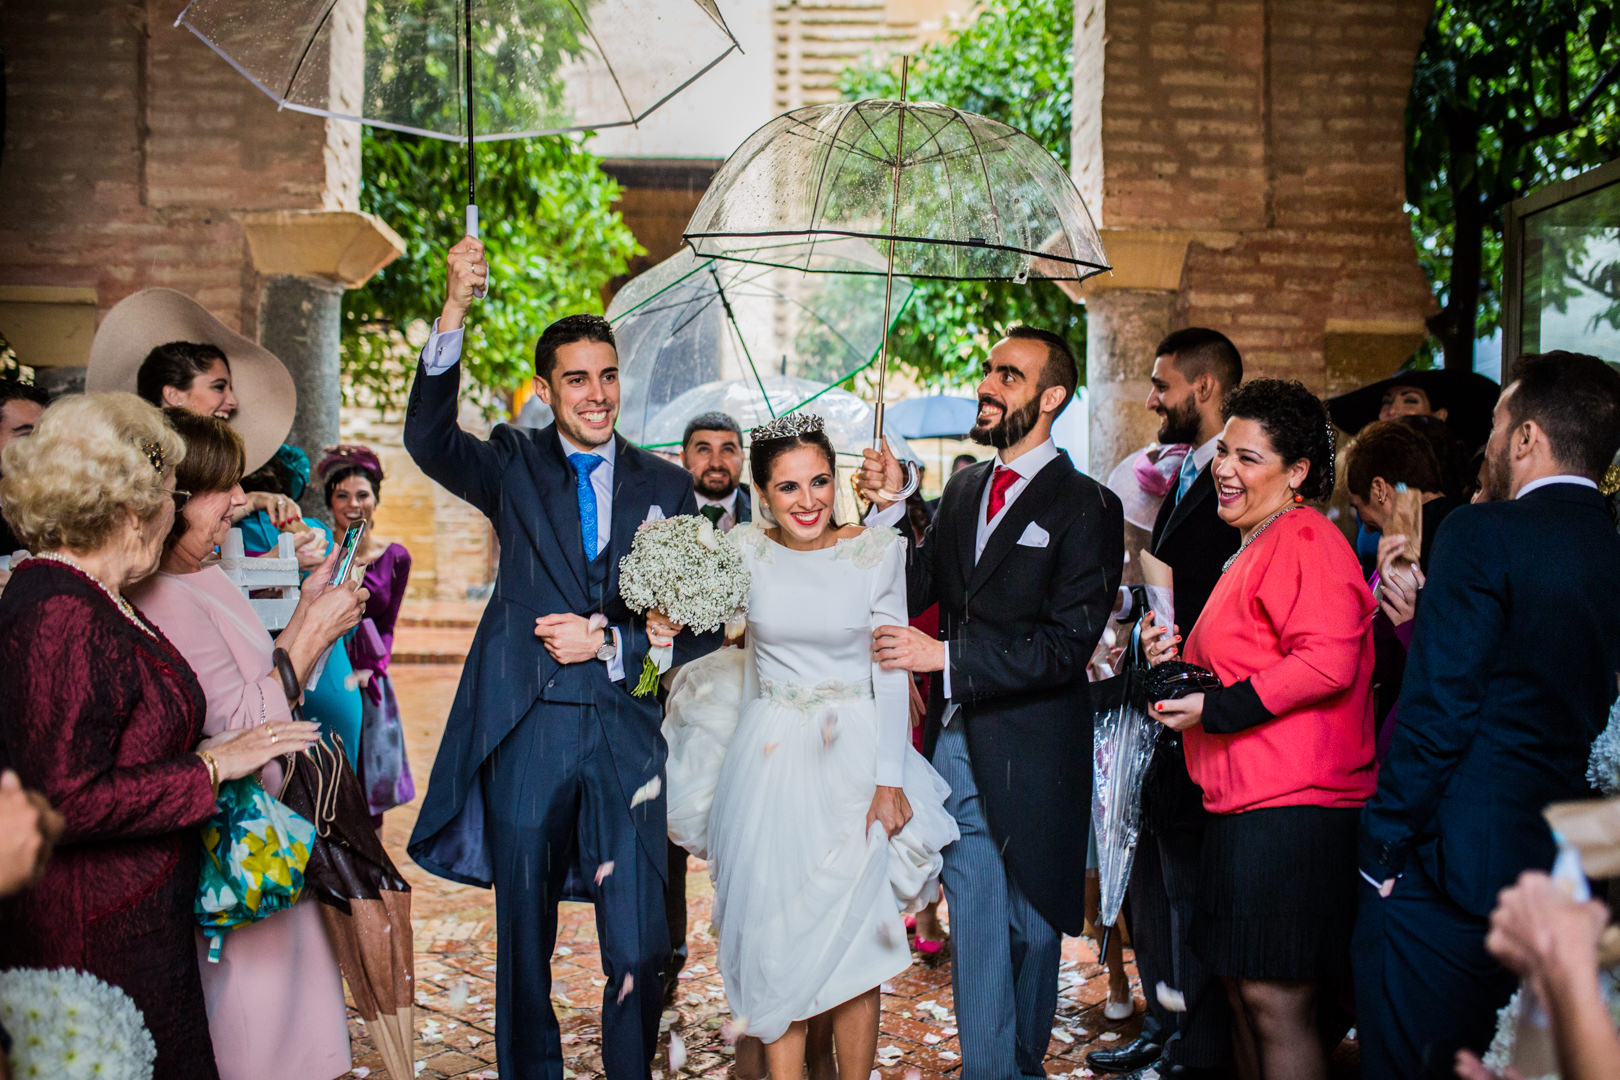 Boda-sevilla-Wedding-engagement-Rafael-Torres-fotografo-bodas-sevilla-madrid-barcelona-wedding-photographer--39.jpg